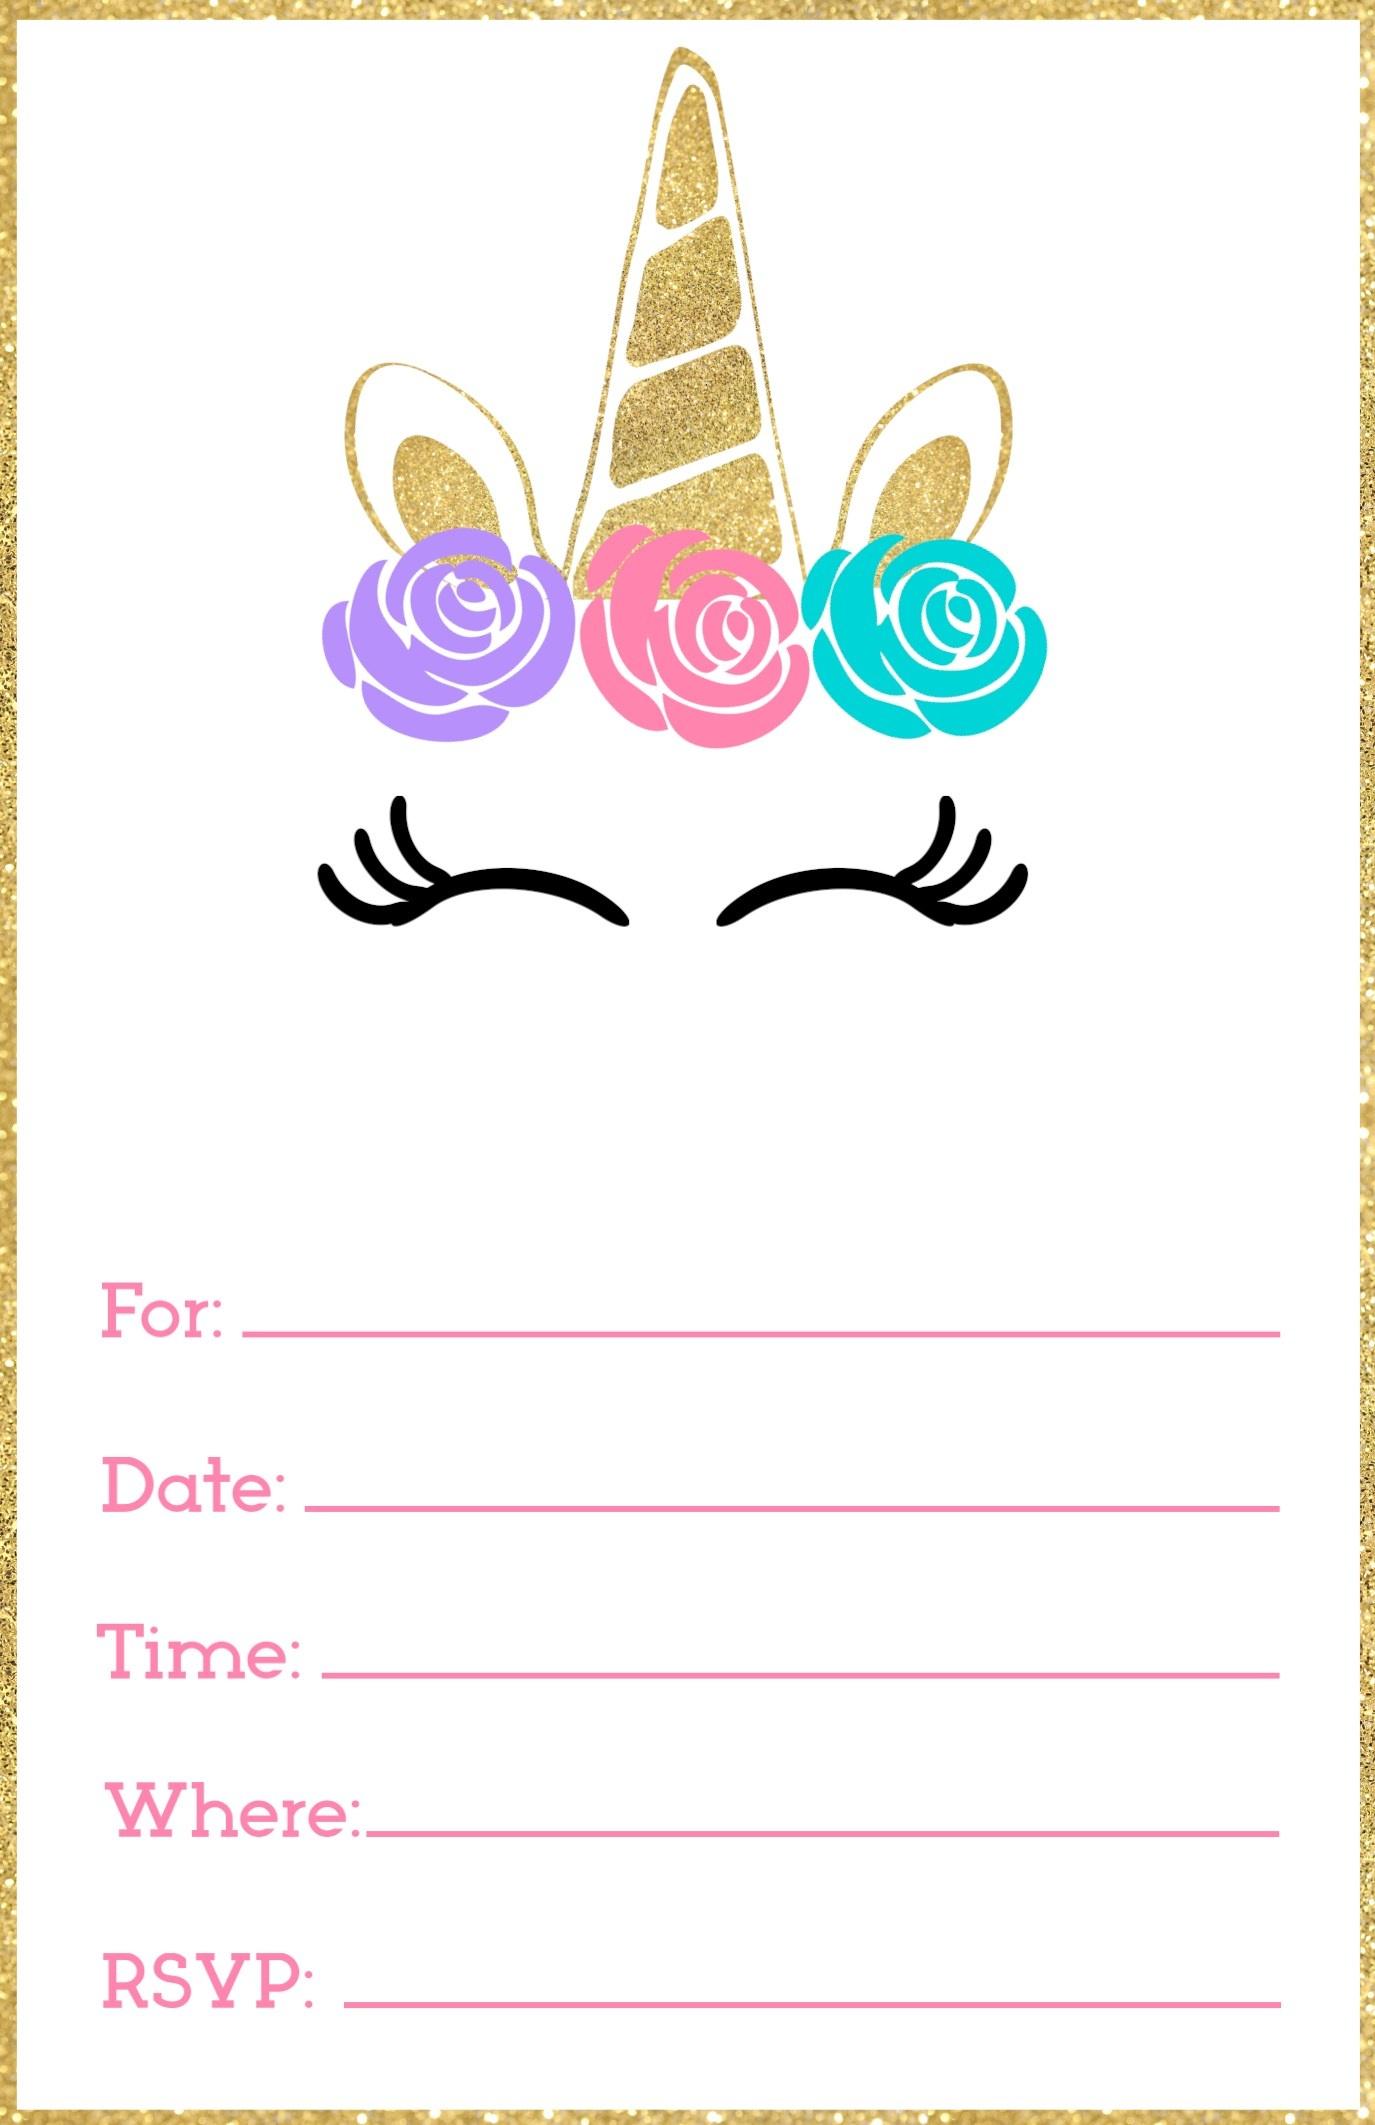 Free Printable Unicorn Invitations Template - Paper Trail Design - Free Printable Birthday Invitation Templates